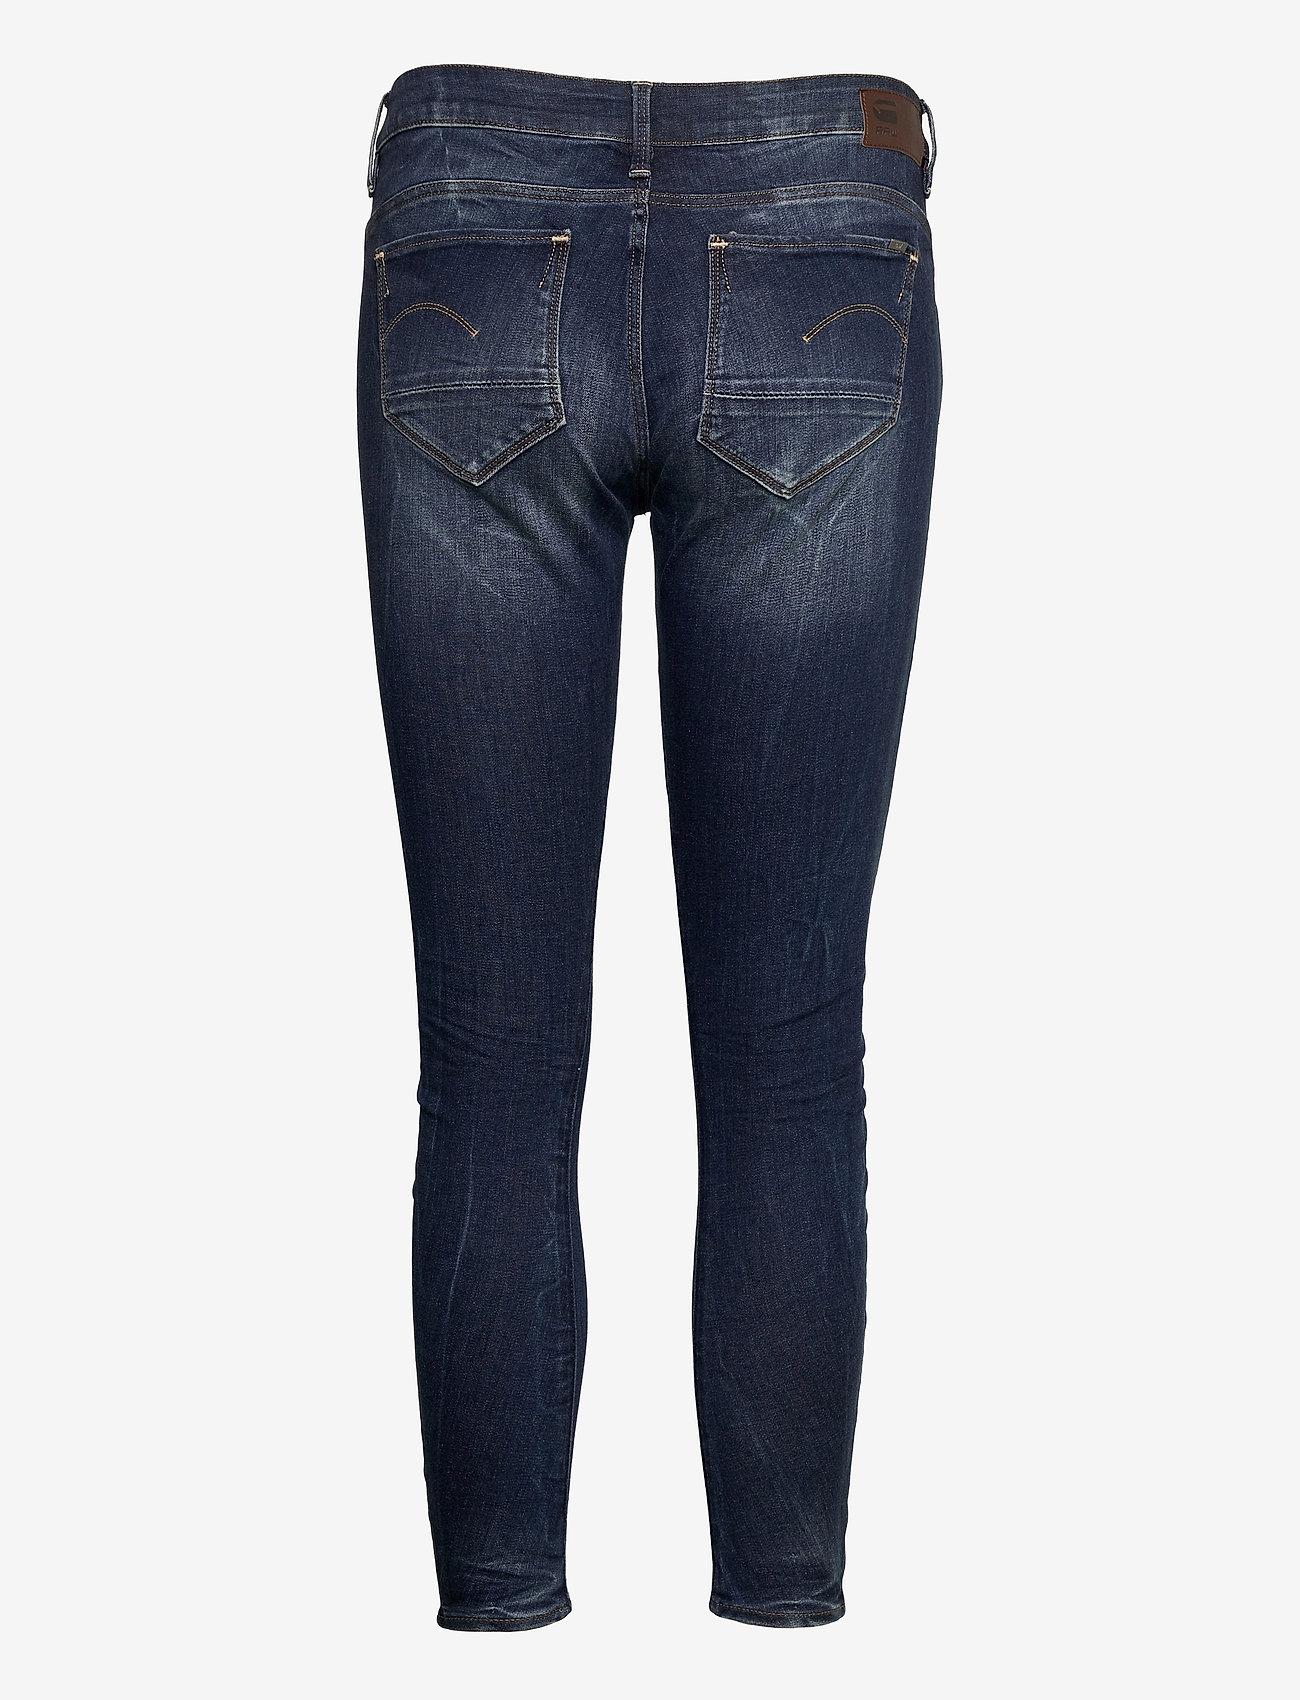 G-star RAW - Arc 3D Mid Skinny Wmn - skinny jeans - dk aged - 1